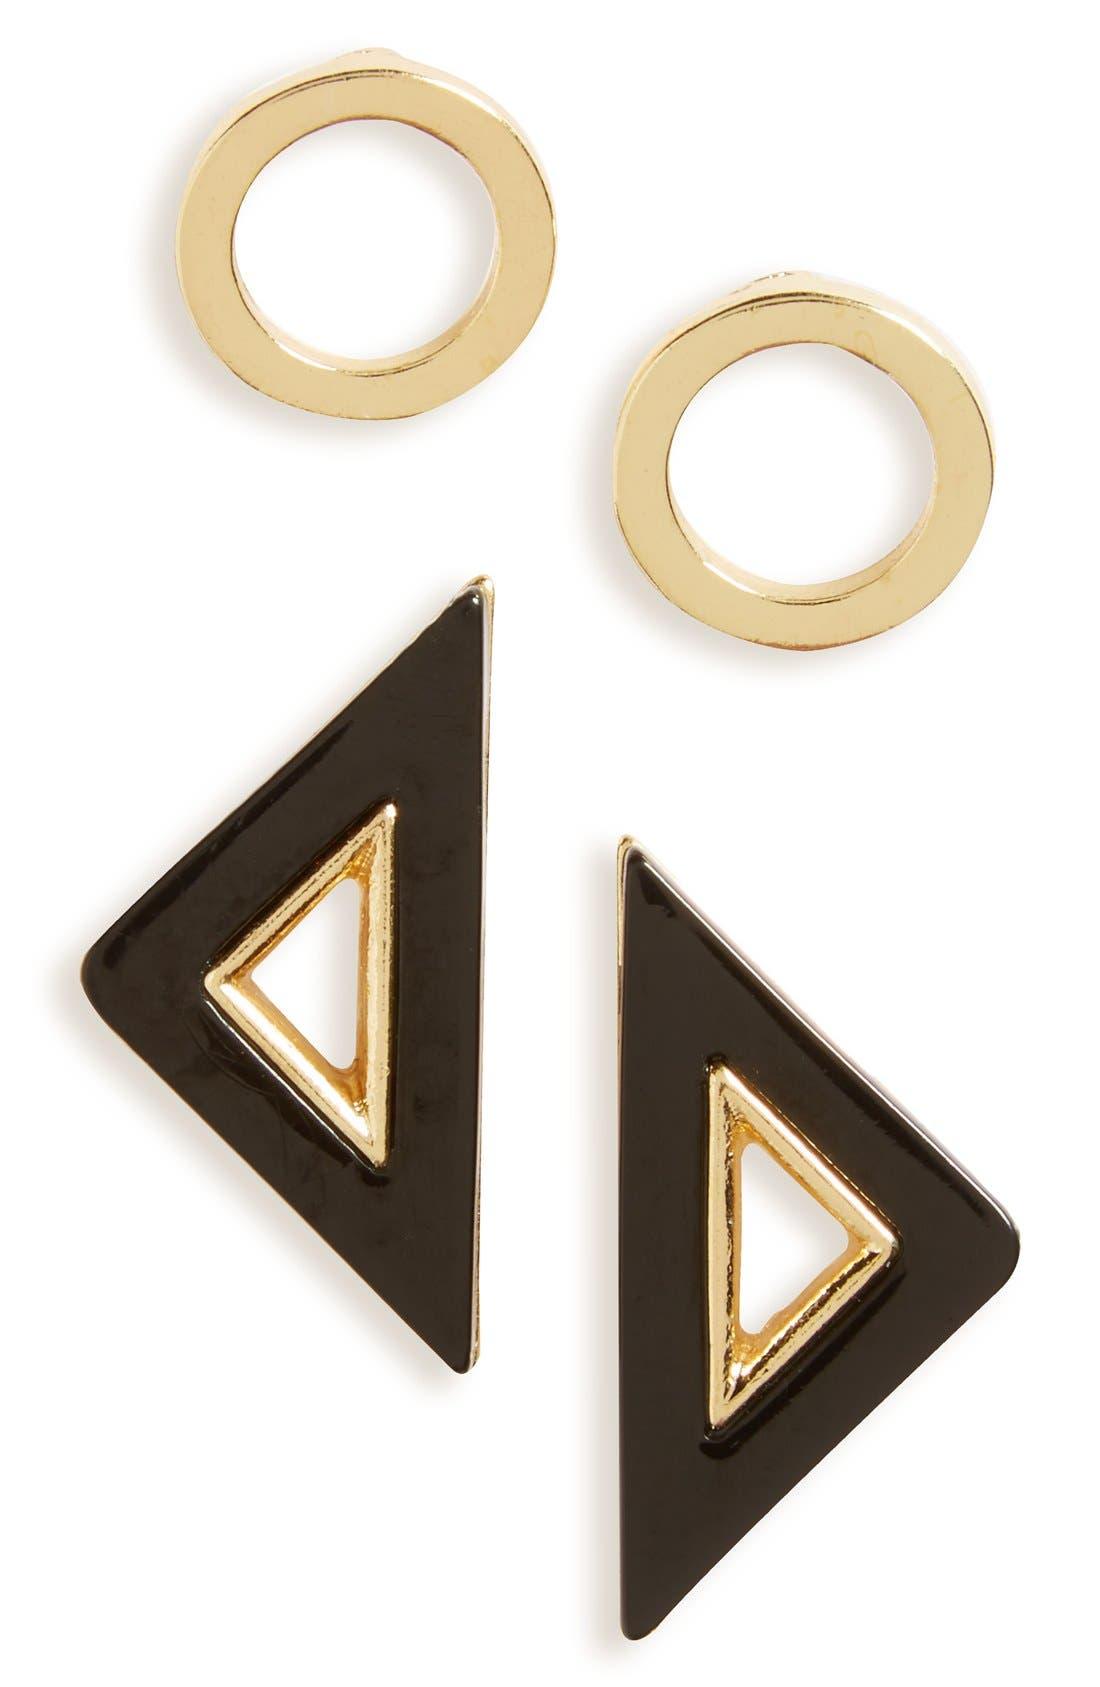 Main Image - Topshop Circle & Triangle Stud Earrings (Set of 2)